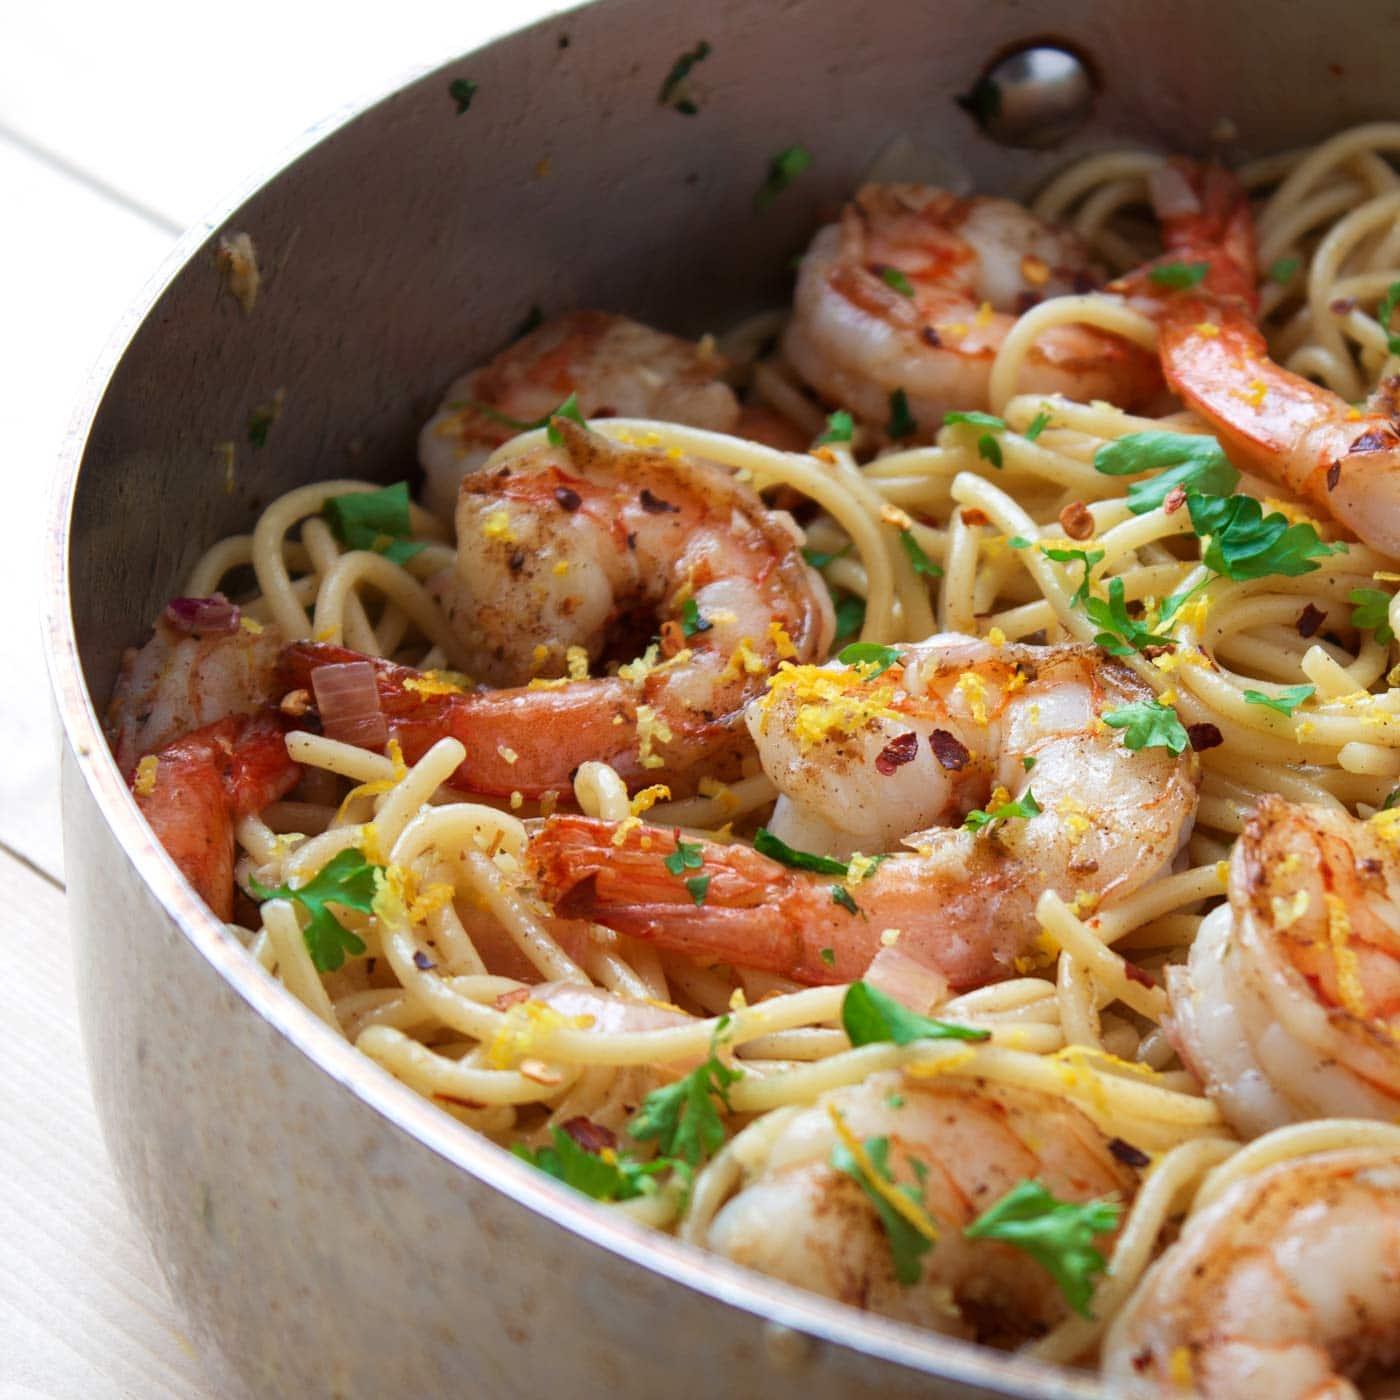 20-Minute Paleo Shrimp Scampi | Kit's Coastal | #kitscoastal #coastalpaleo #paleo #glutenfree #dairyfree #shrimp #shrimpscampi